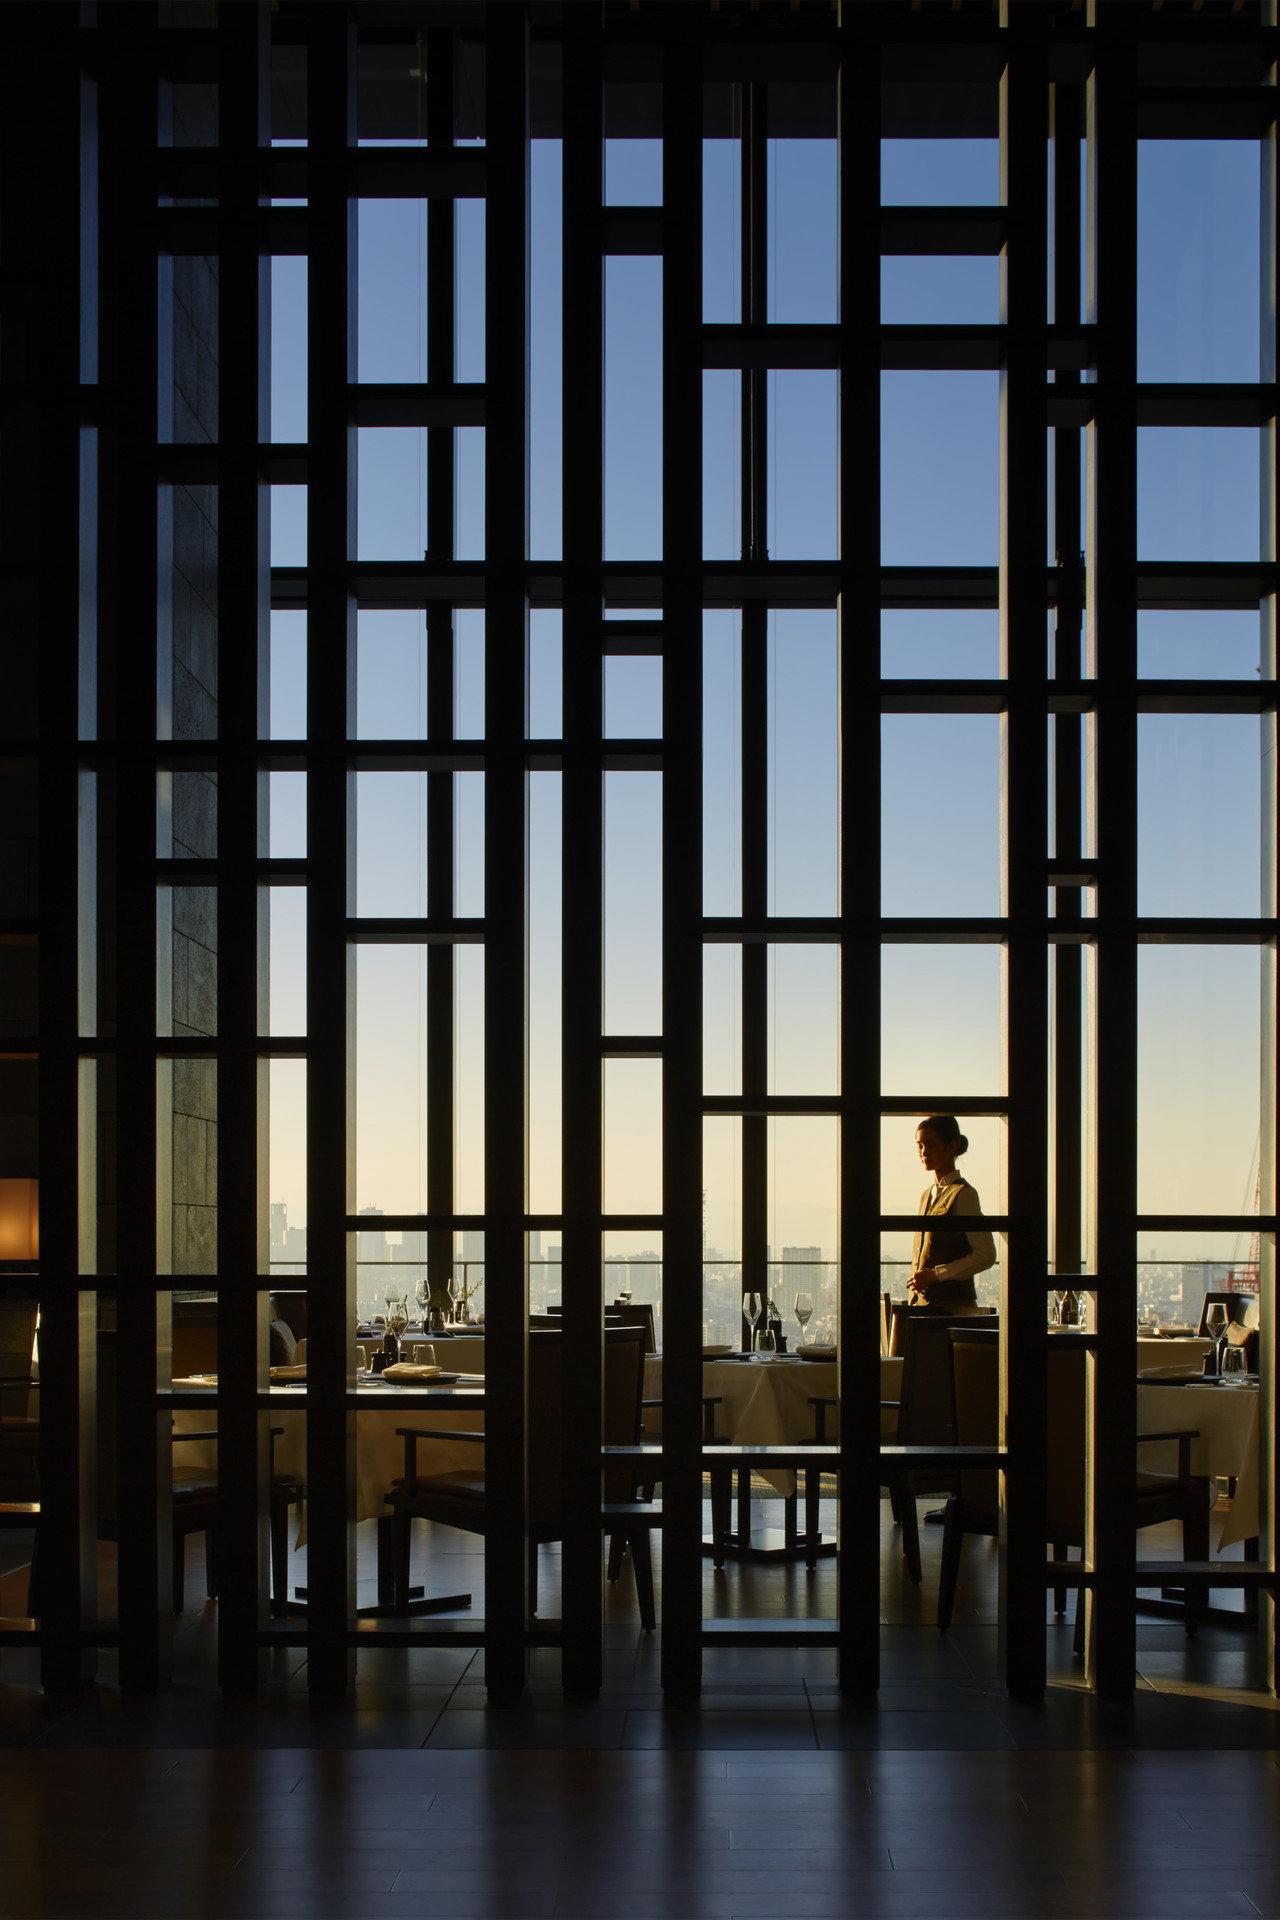 Hotels Japan Tokyo window building Architecture facade reflection interior design headquarters wood symmetry Design tourist attraction glass